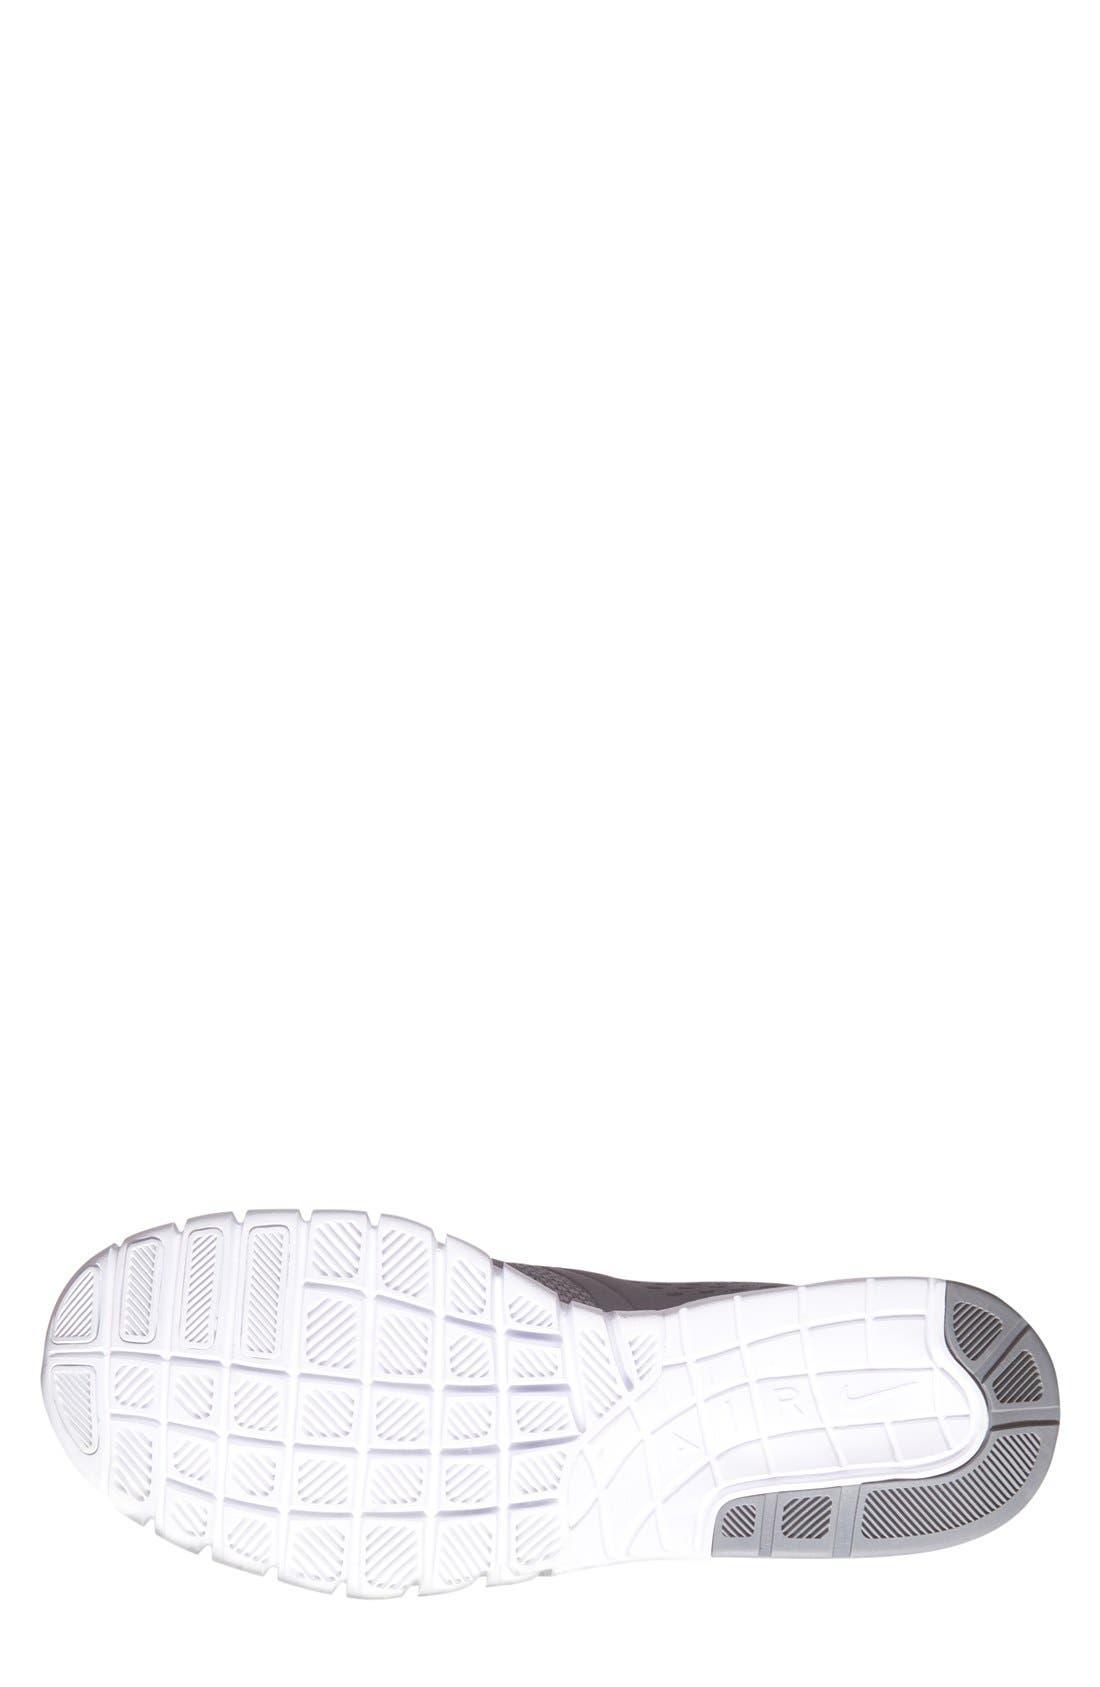 'Eric Koston 2 Max' Skate Sneaker,                             Alternate thumbnail 4, color,                             088